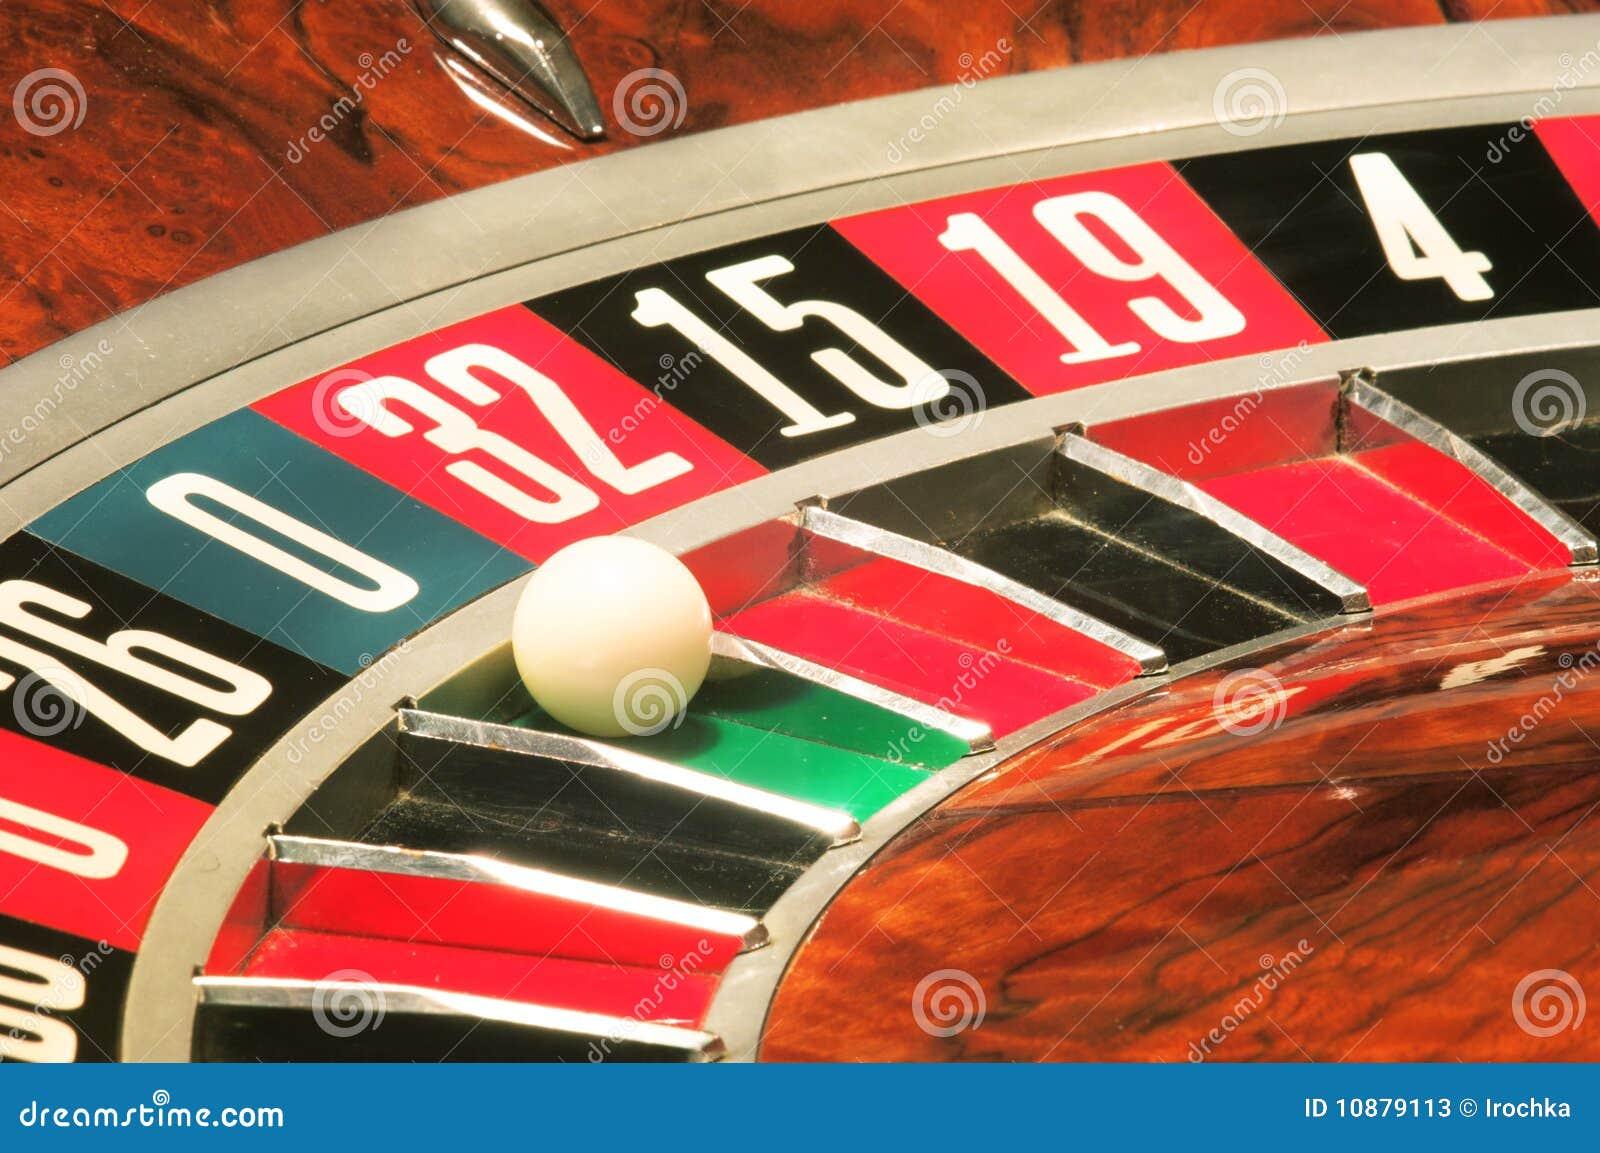 Tragamonedas casino room Real Time - 39950